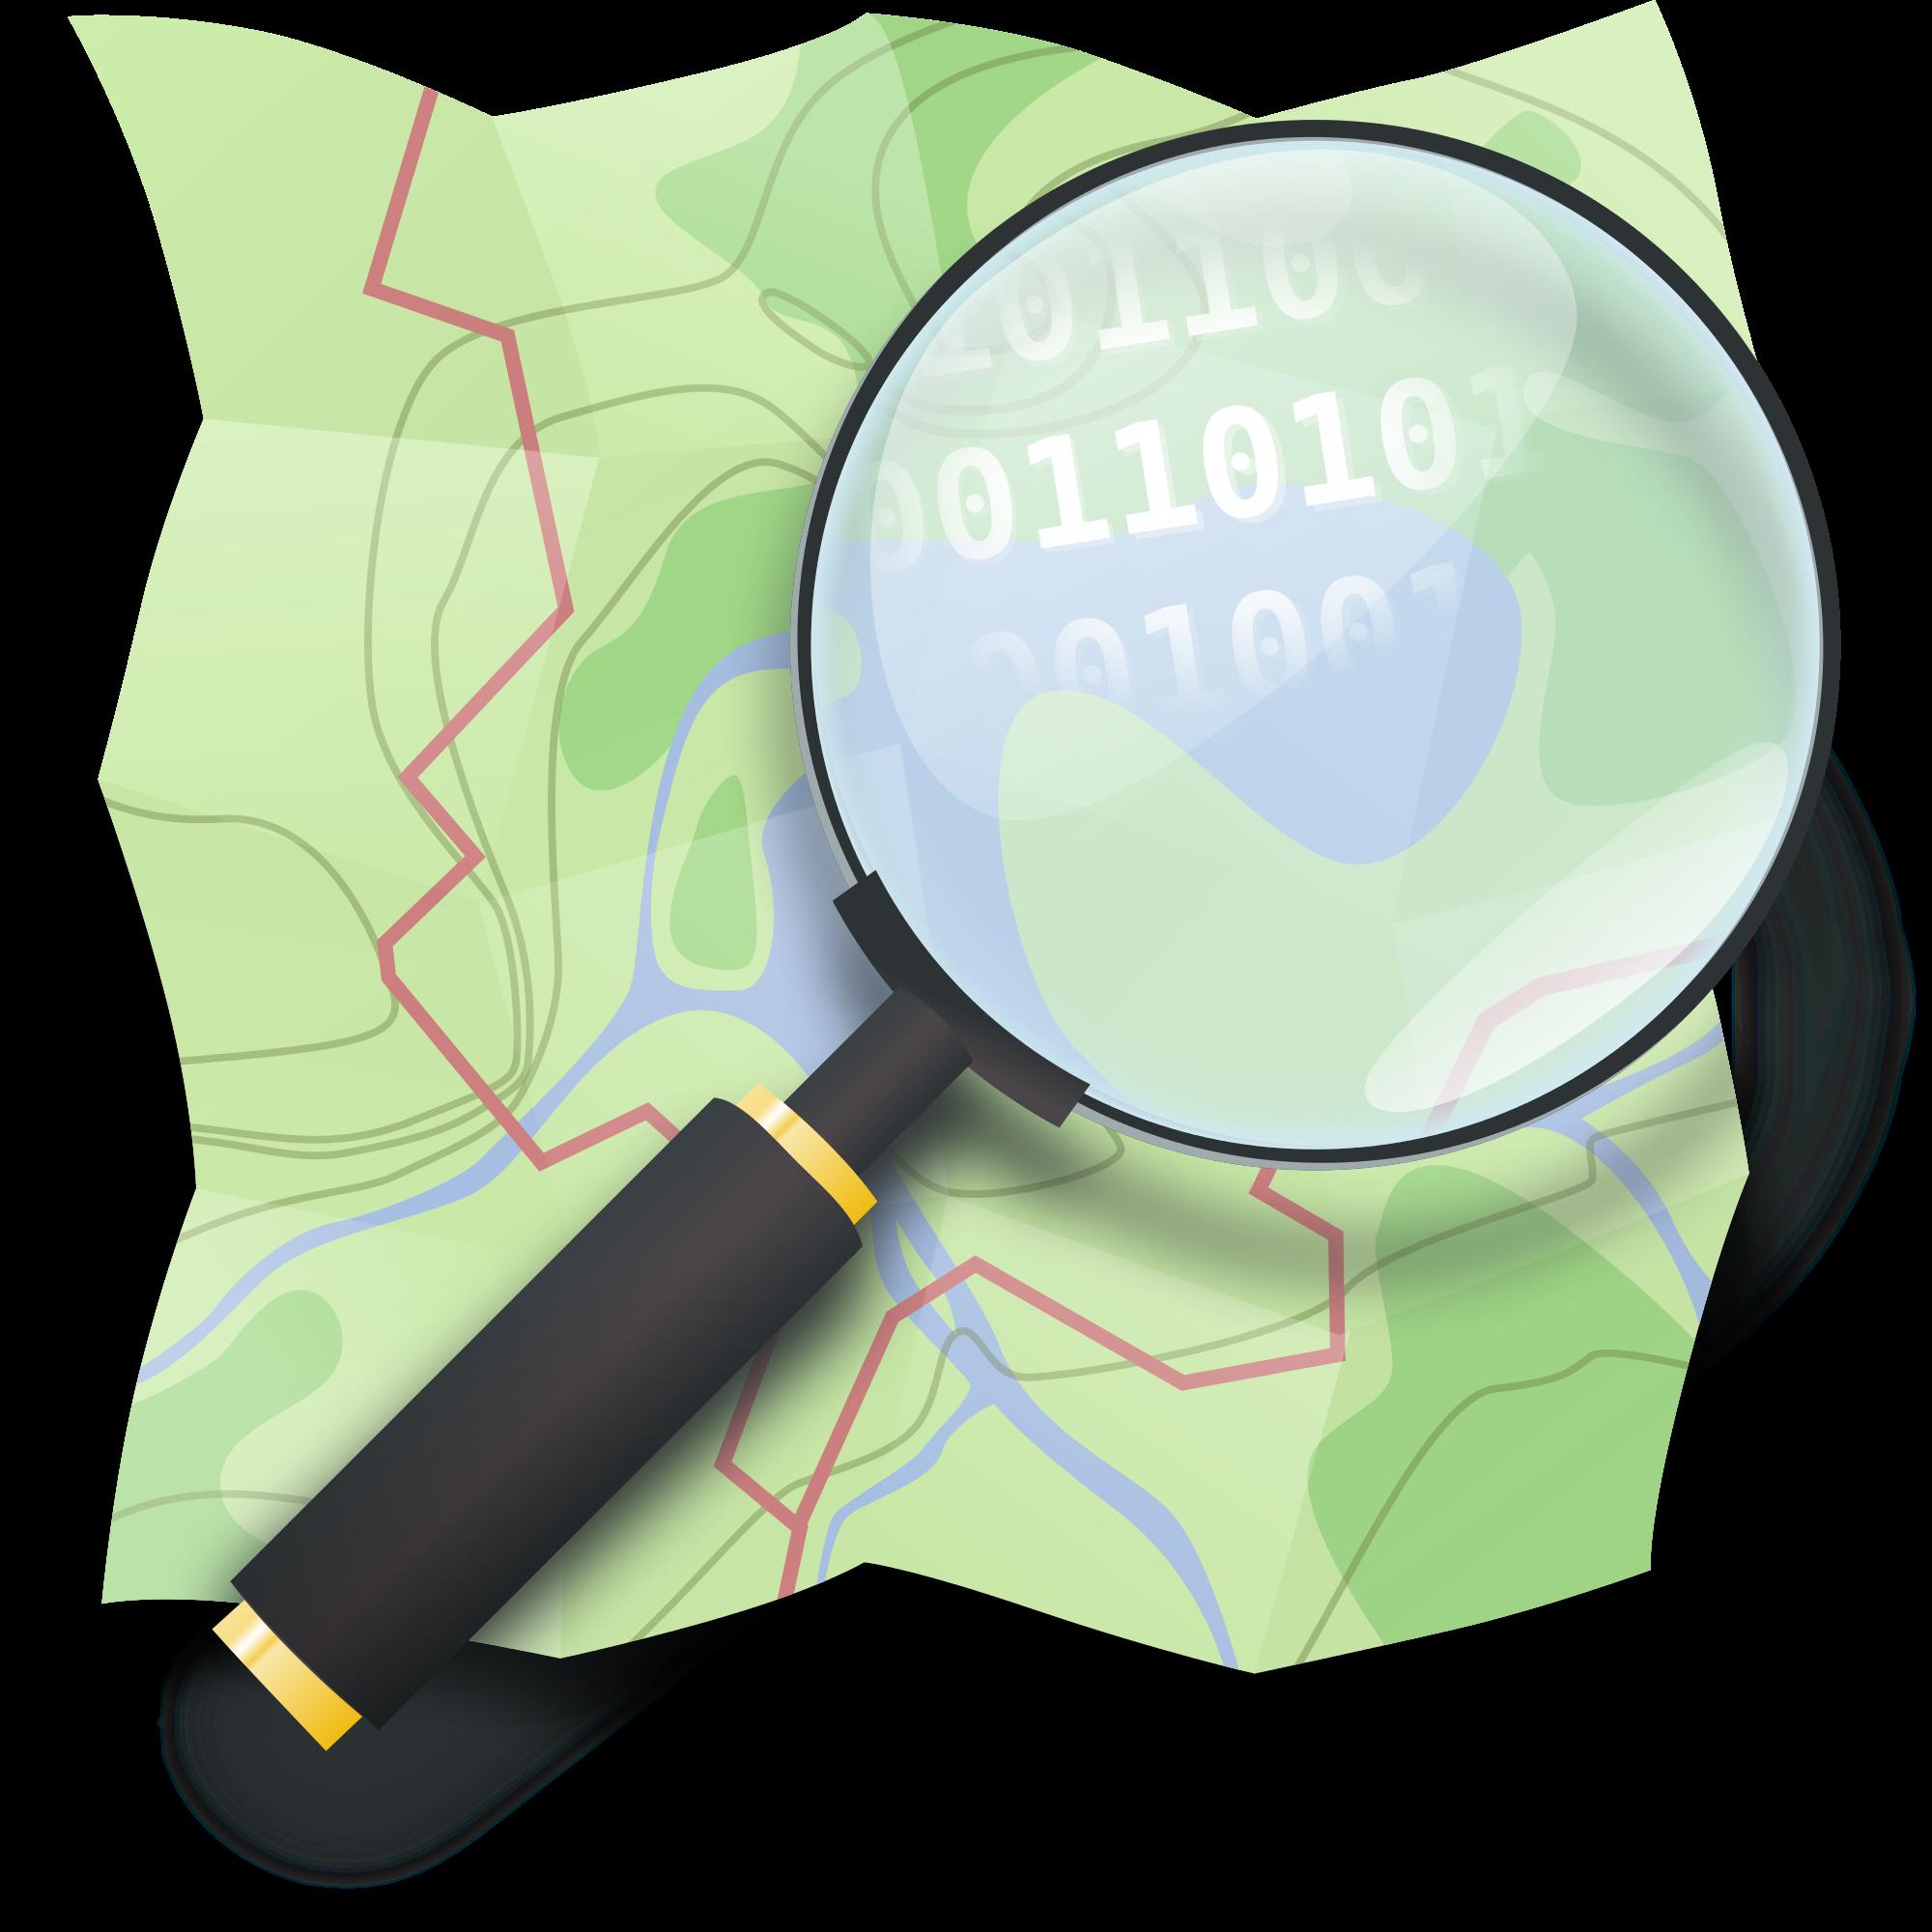 image logo_Openstreetmap.png (1.1MB)